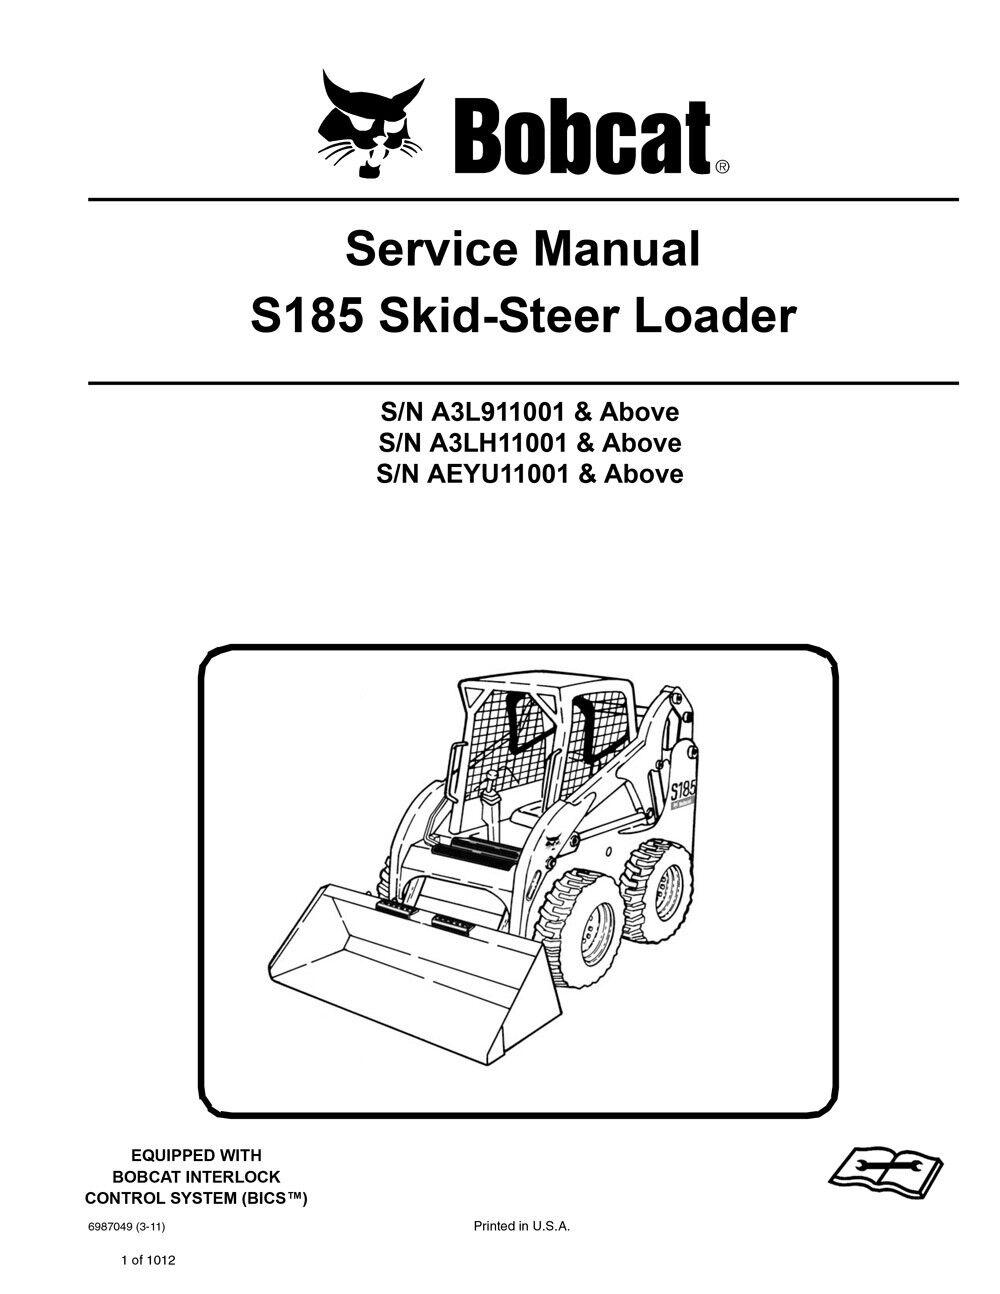 medium resolution of new bobcat s185 skid steer loader 2011 edition service repair manual 6987049 image